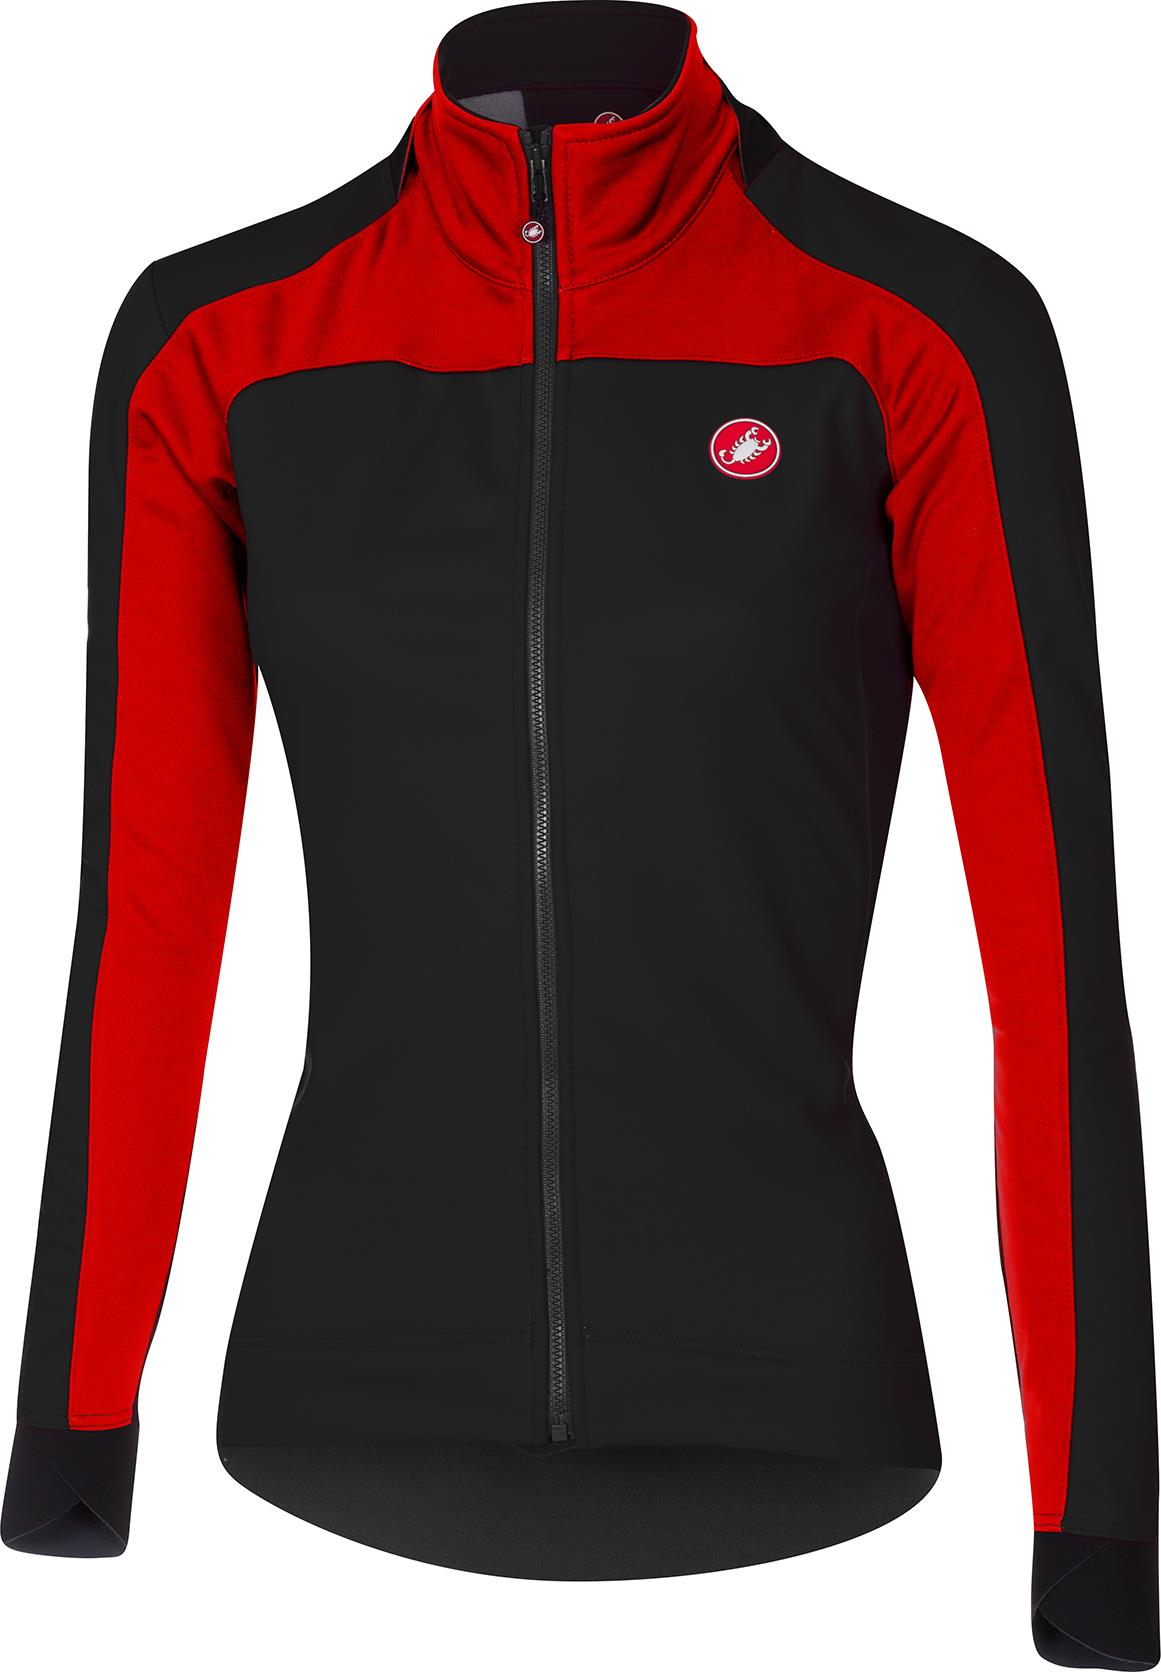 c963d02a1 Castelli Mortirolo 2 Womens Cycling Jacket - AW17. Close